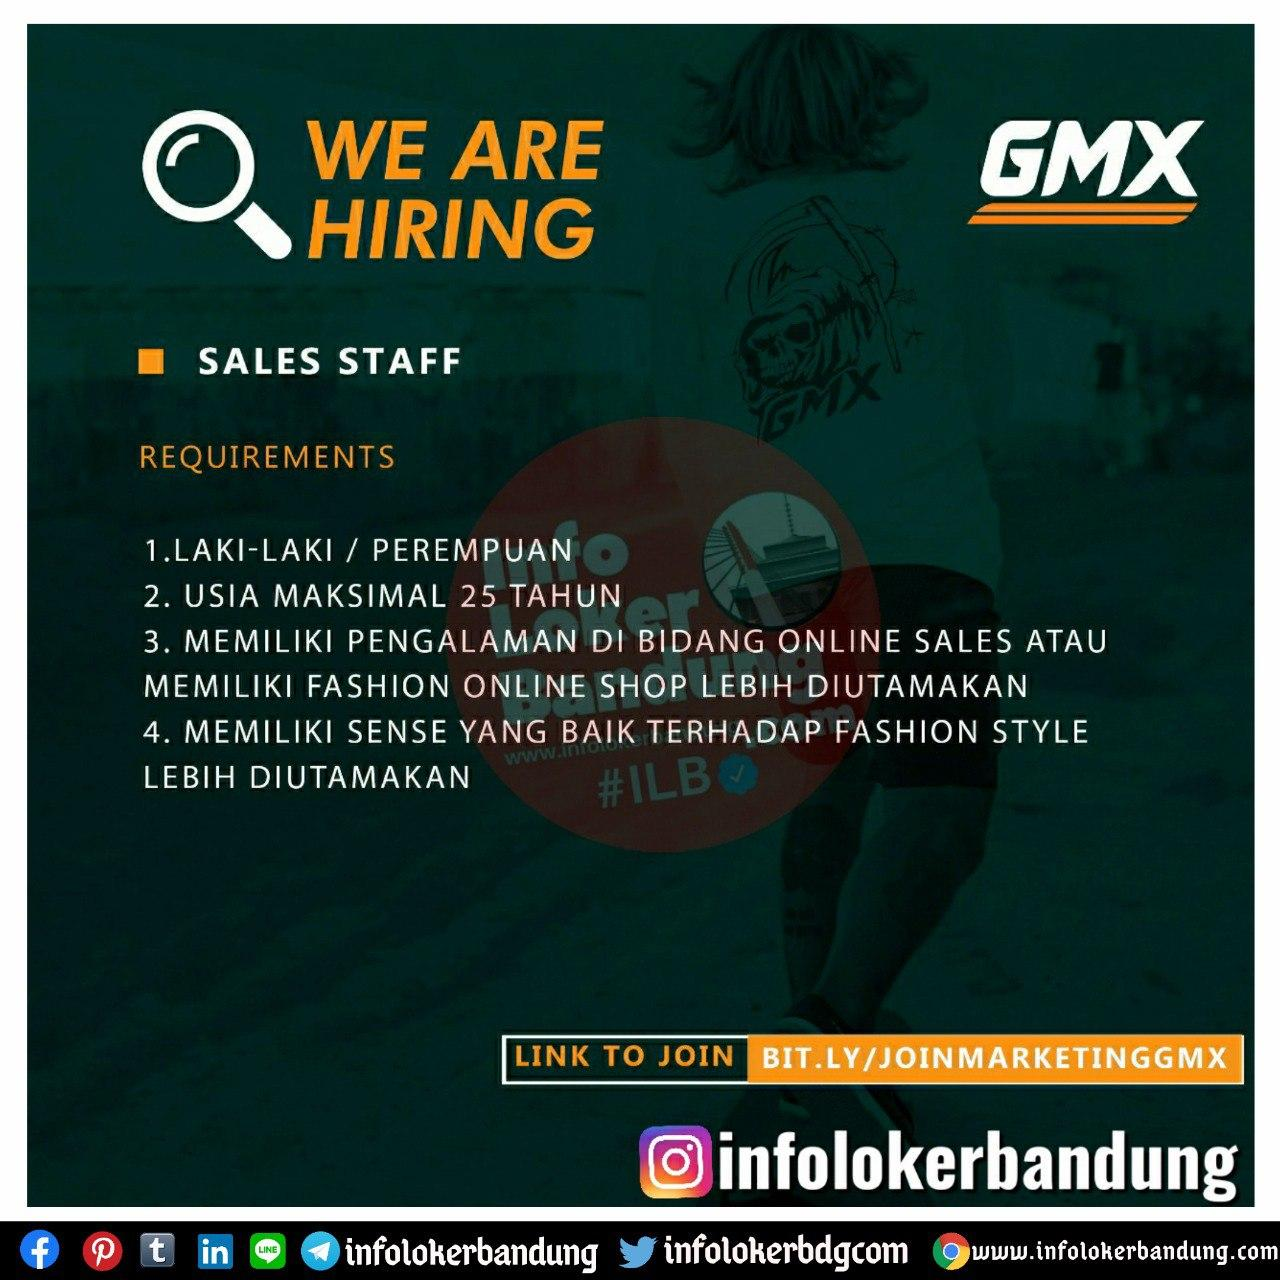 Lowongan Kerja Sales Satff & Sales Marketing Online GMX ...